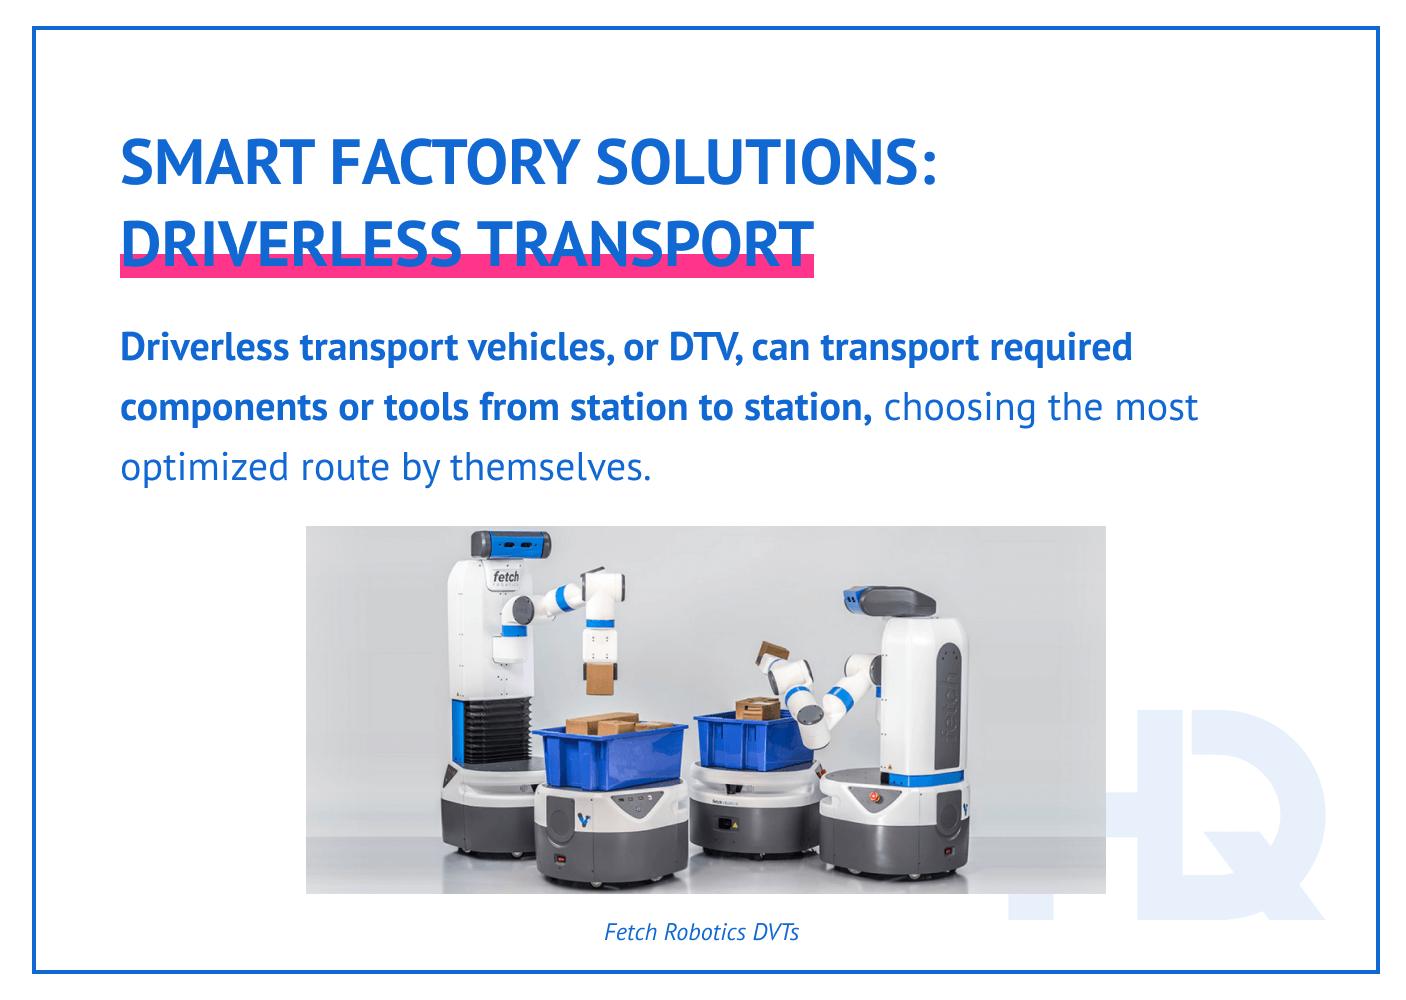 Smart factory solutions: driverless transport.